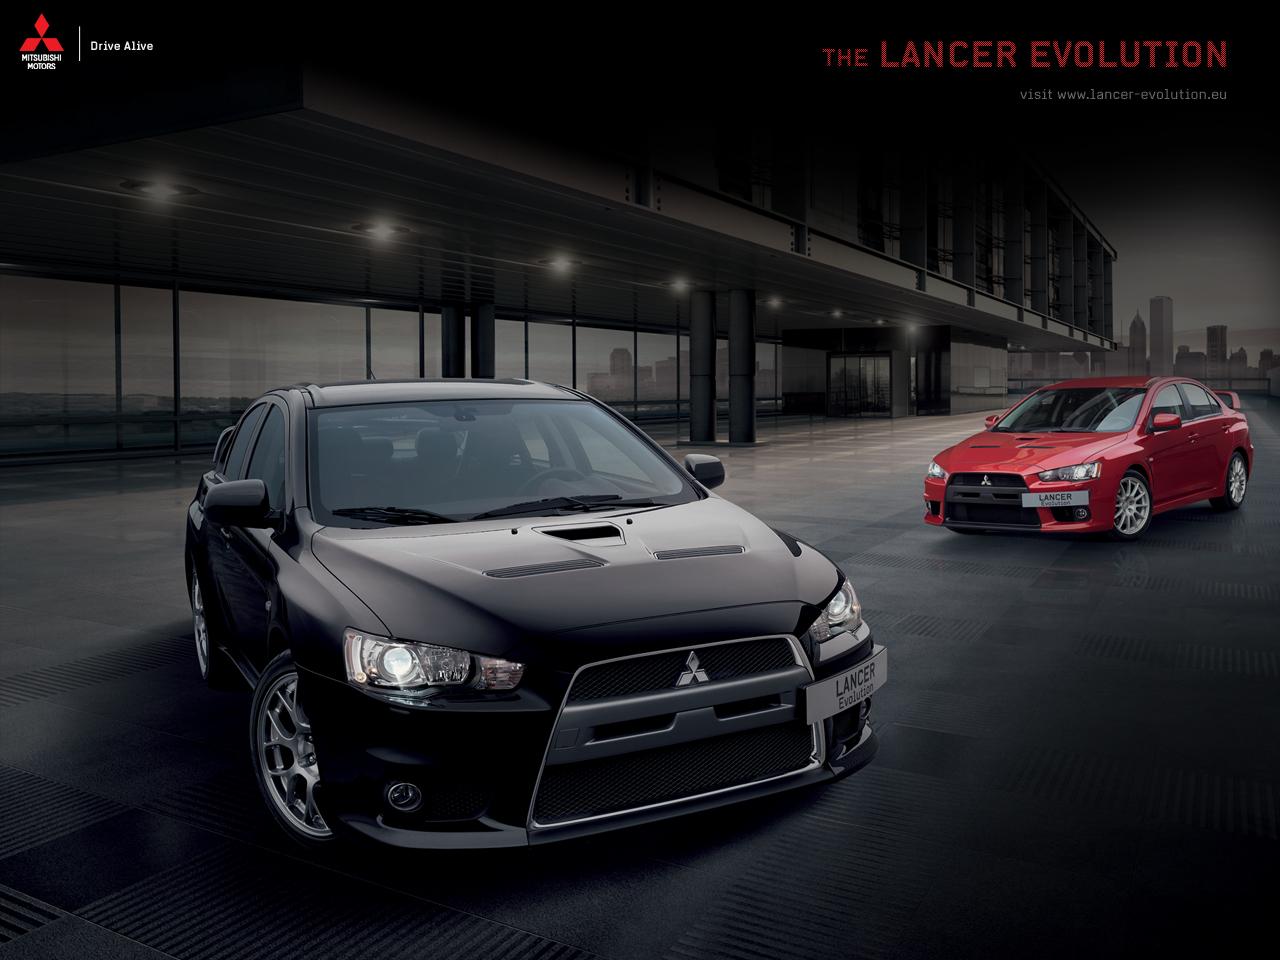 Free Download Mitsubishi Lancer Evolution X Mr 1280x960